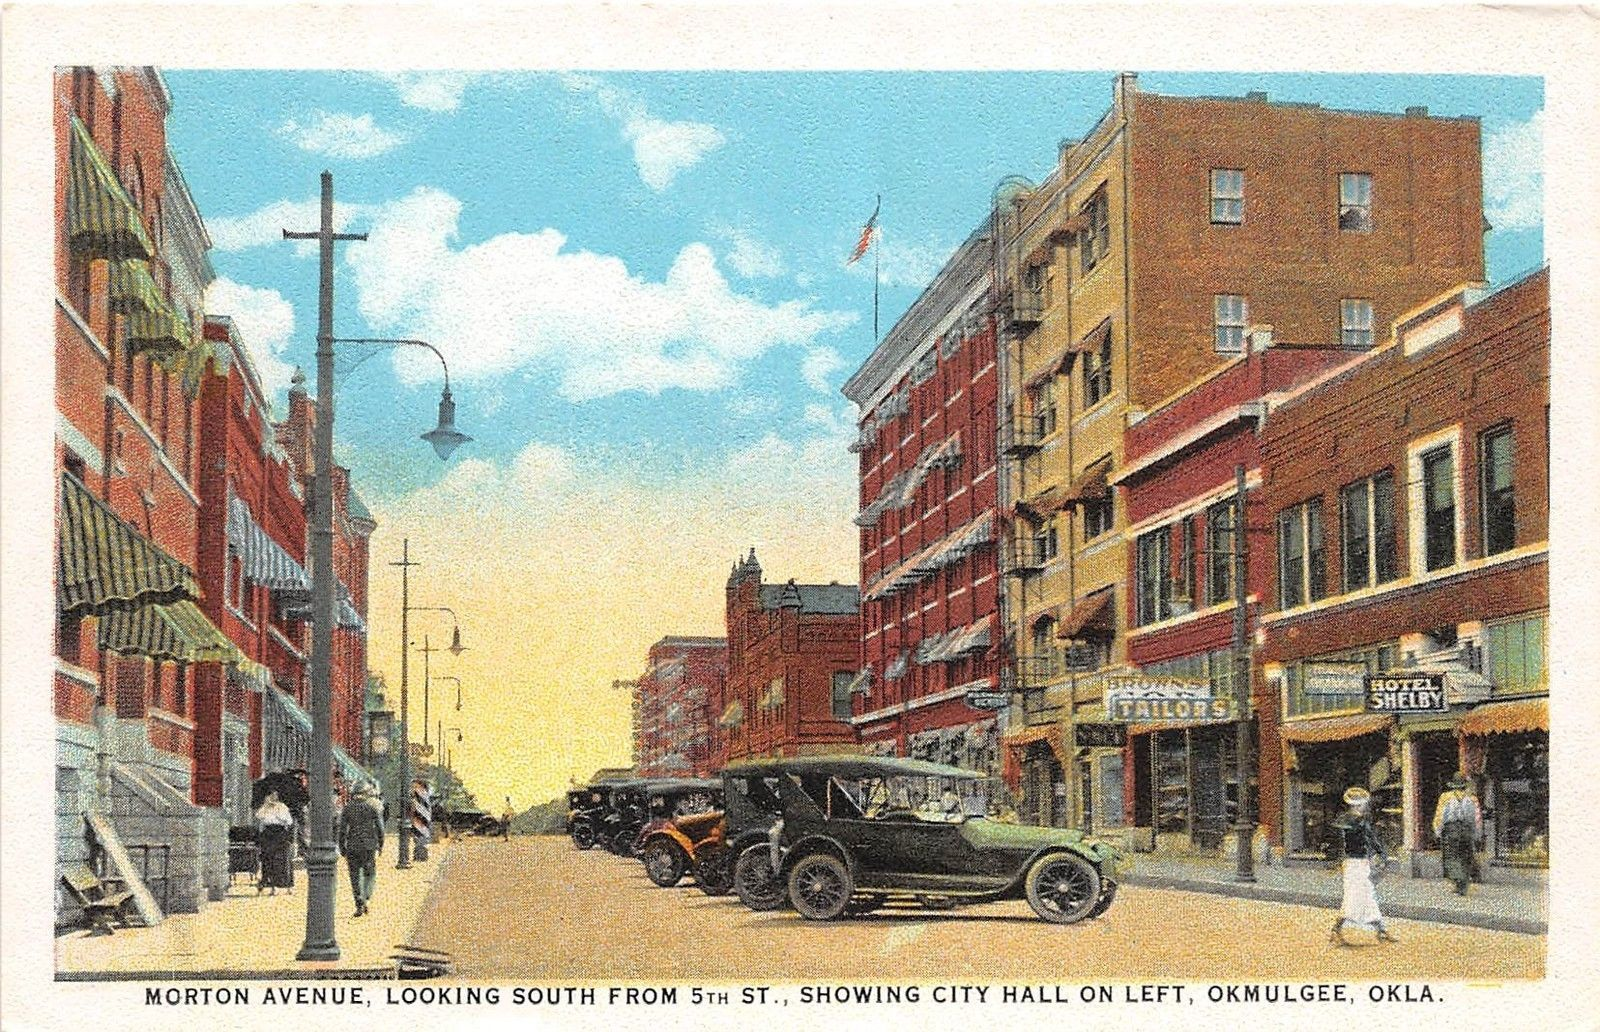 Dating curteich chicago curteichcolor jumbo postcards